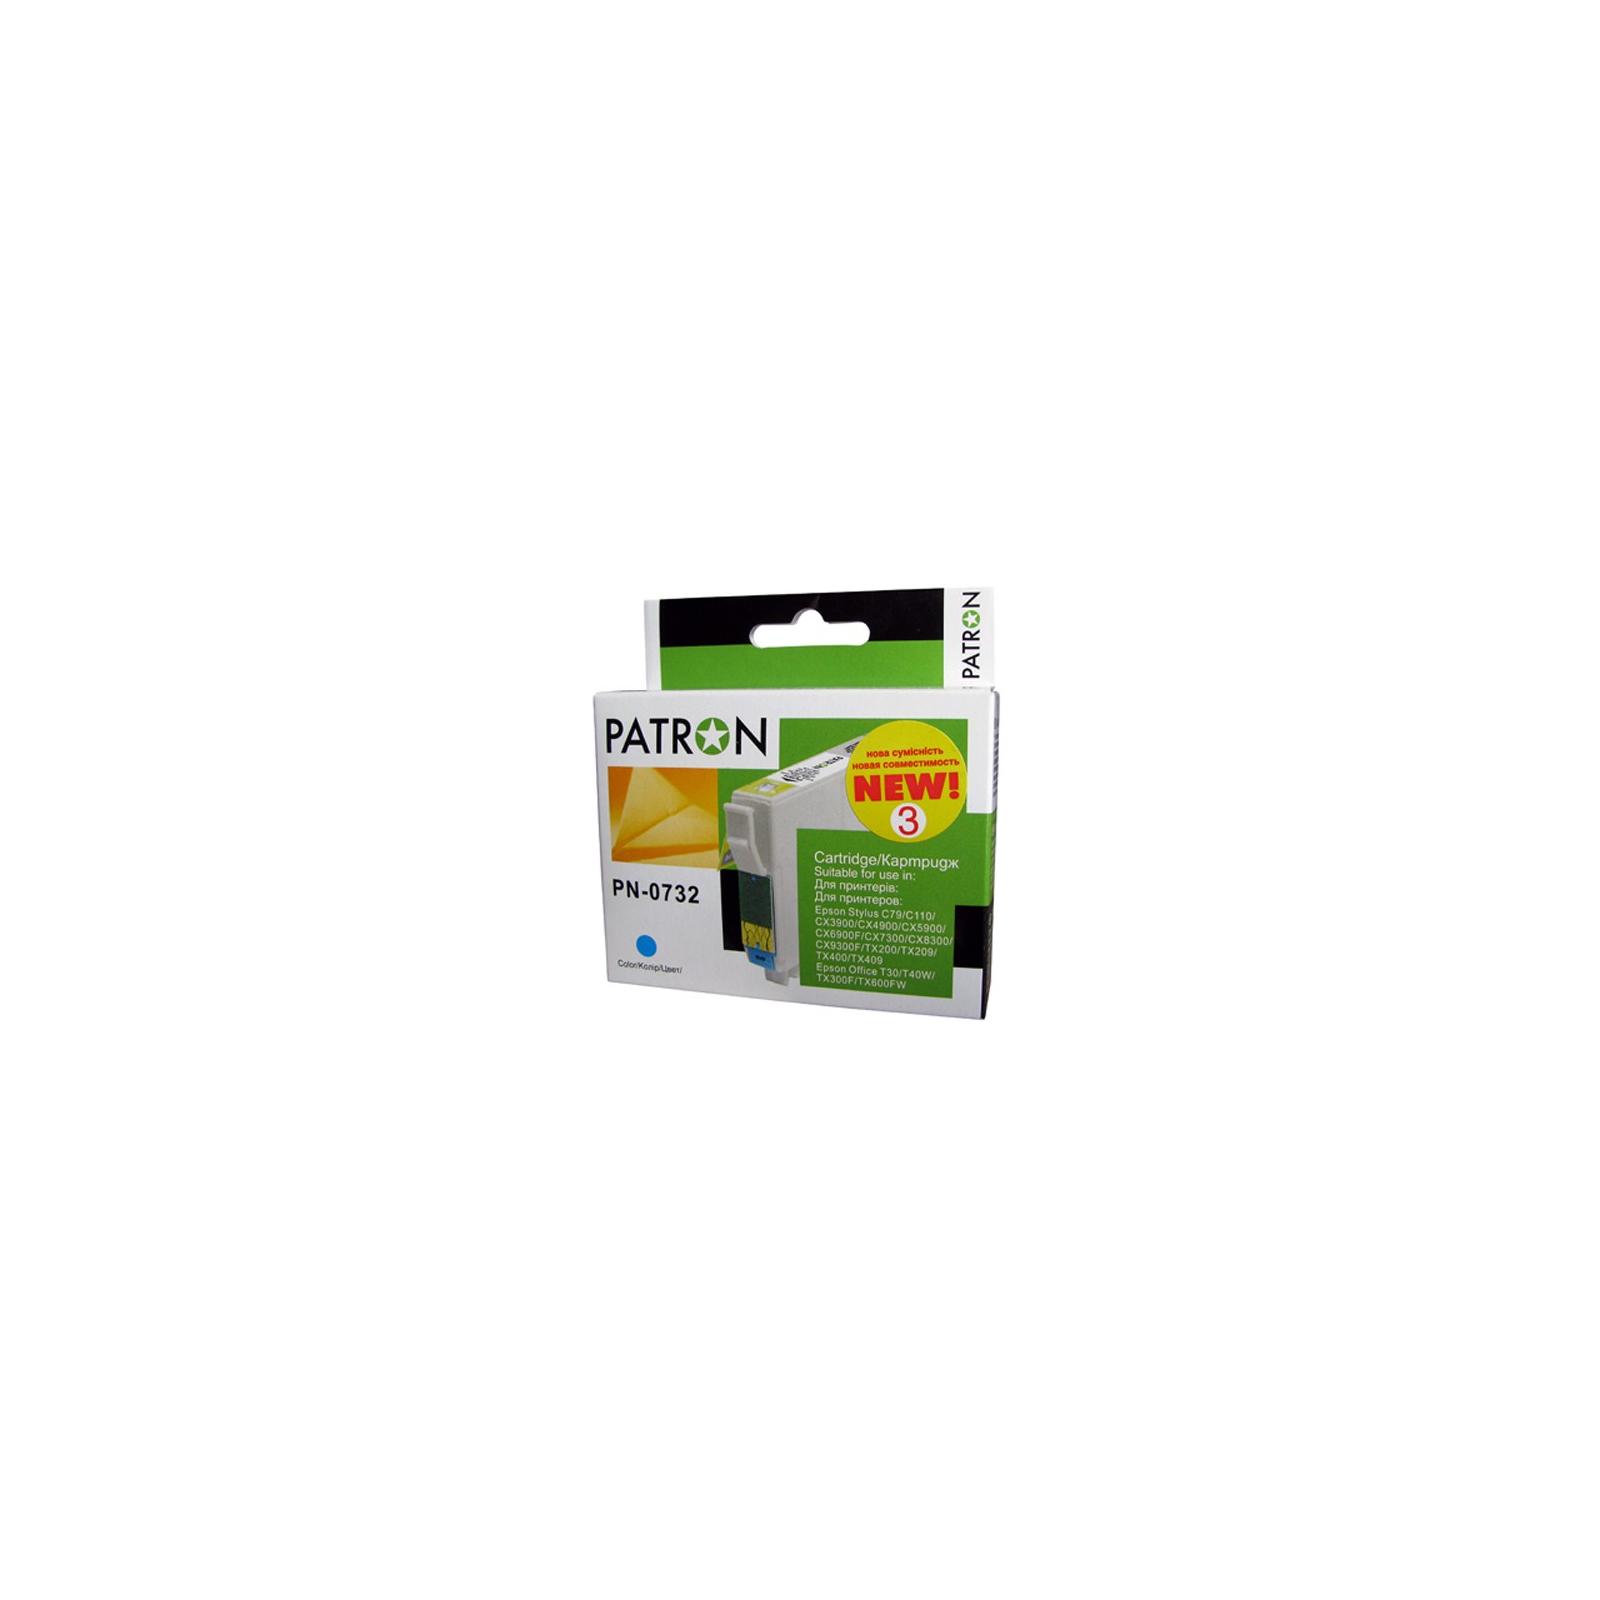 Картридж PATRON для EPSON C79/C110/TX200 cyan (CI-EPS-T07324-C3-PN) изображение 2